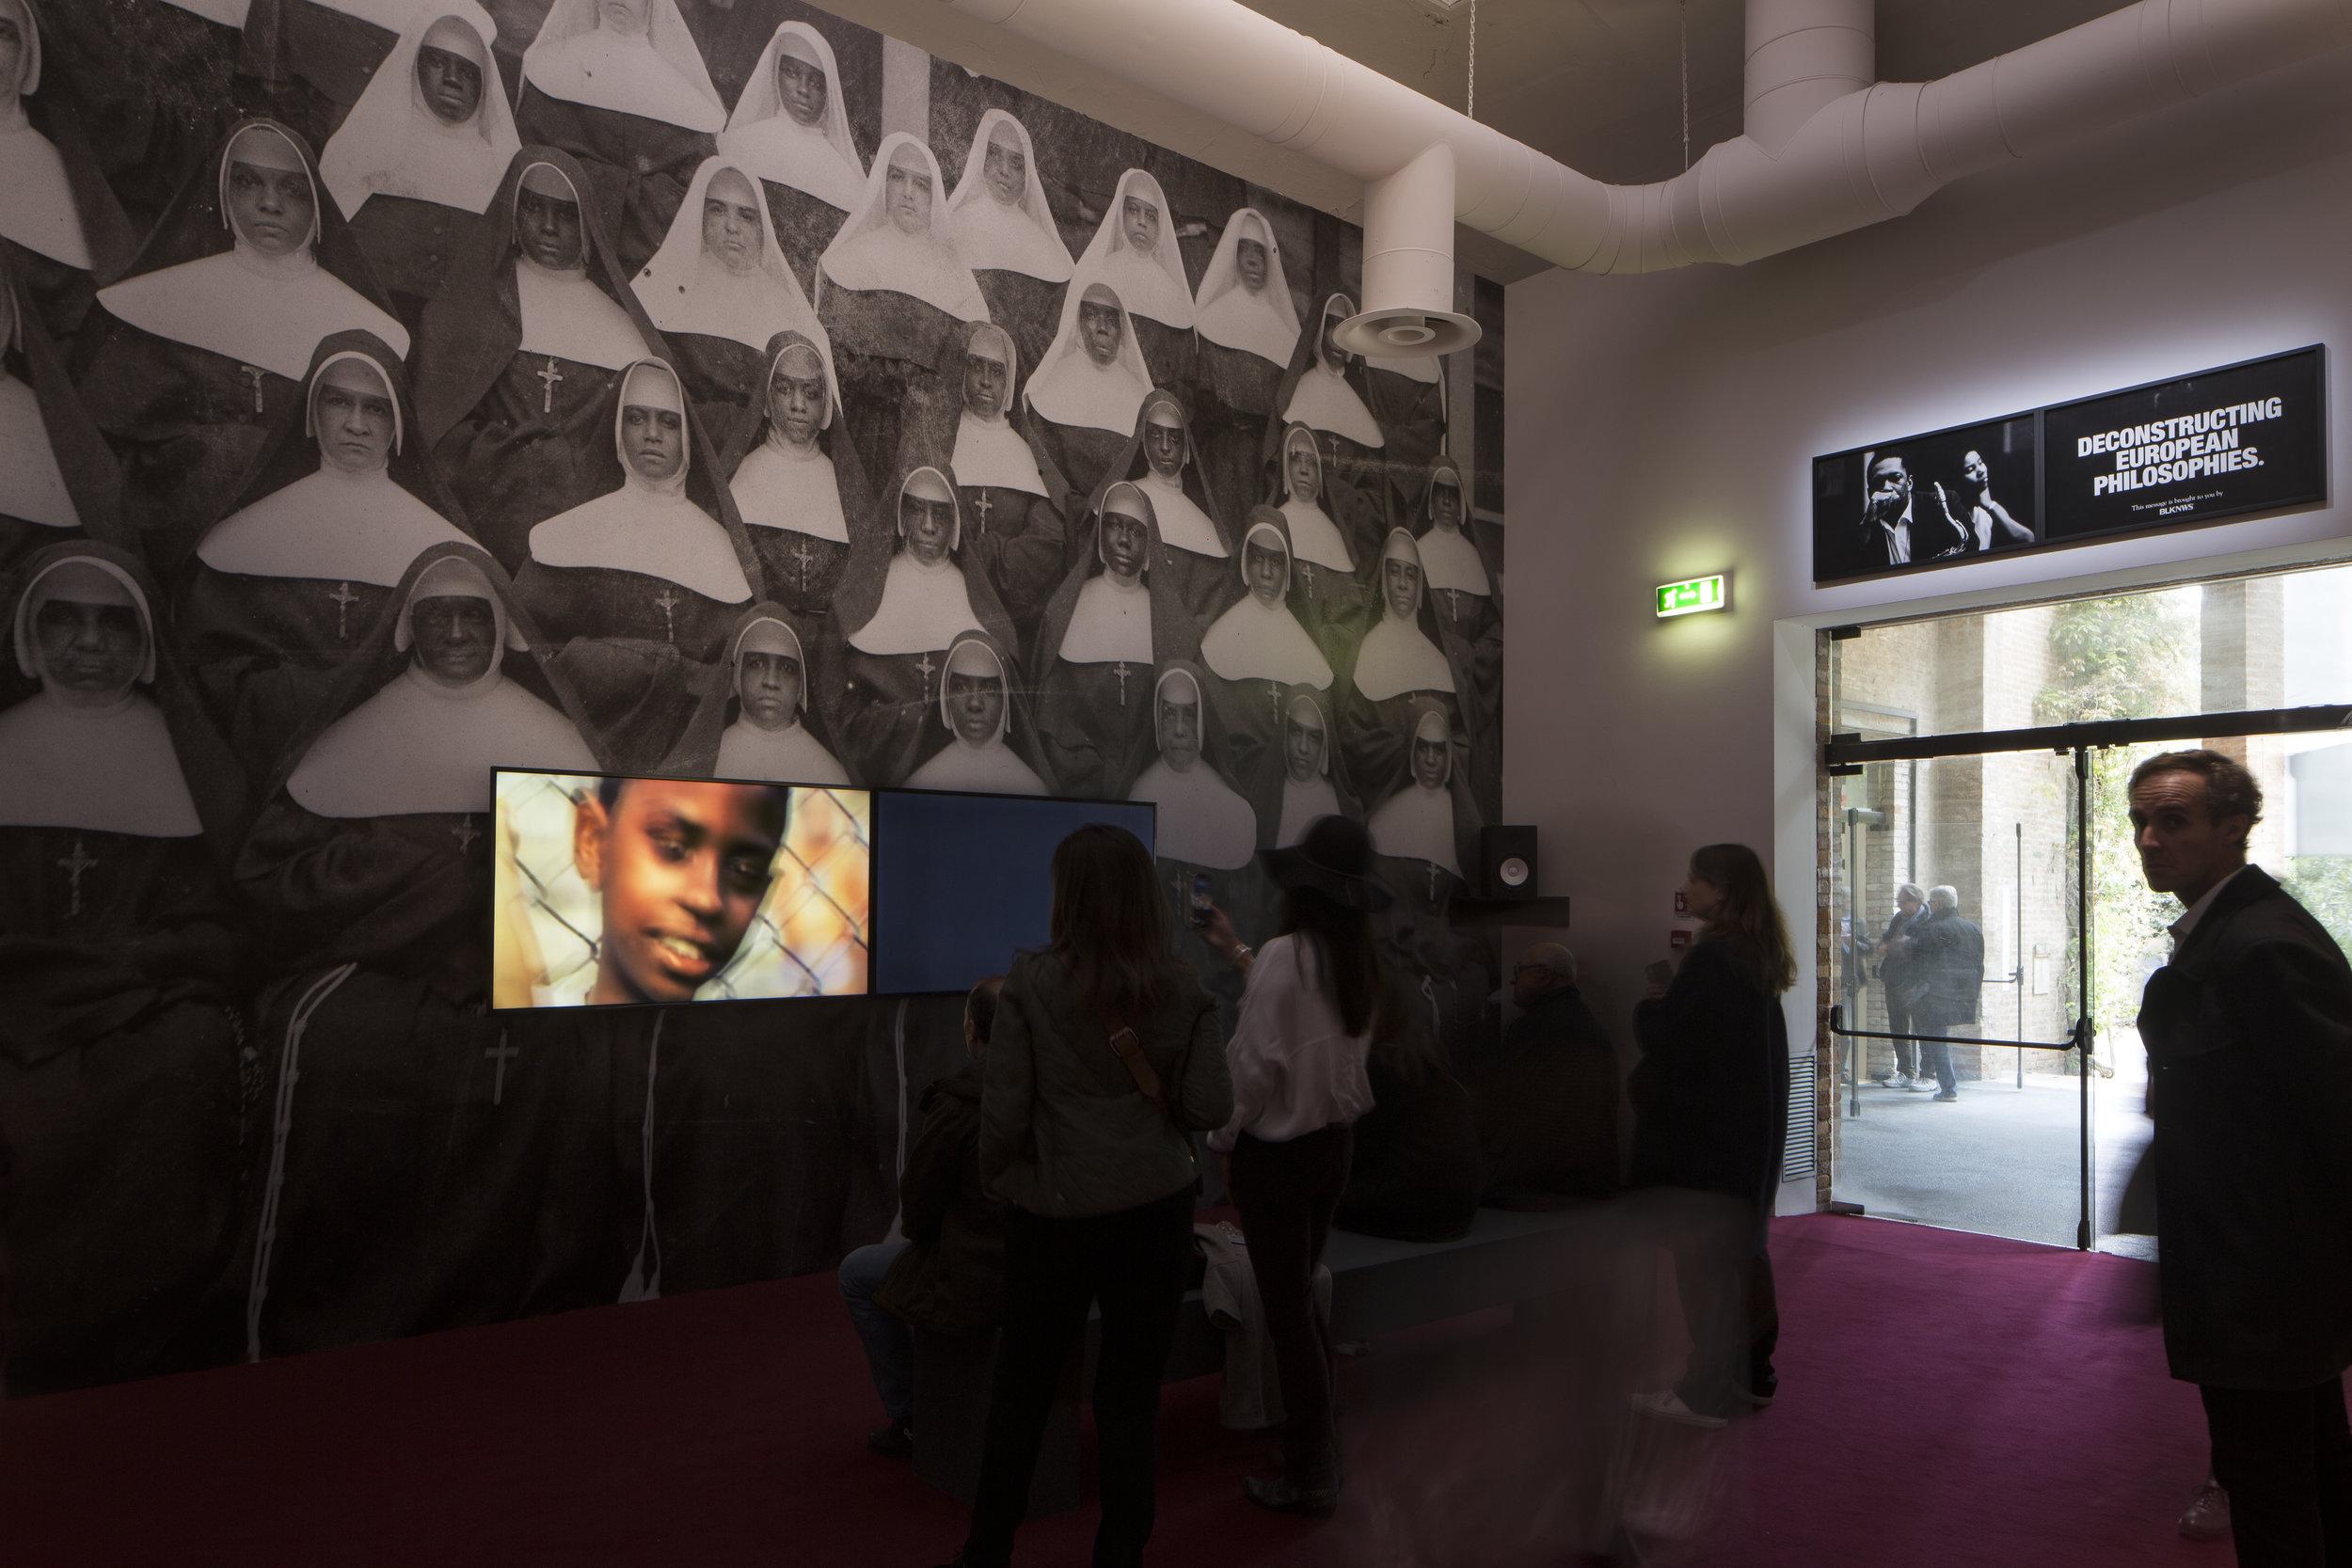 Installation view of  BLKNWS  (2018 - ongoing) by Kahlil Joseph, in Giardini. Courtesy of the artist and La Biennale di Venezia.